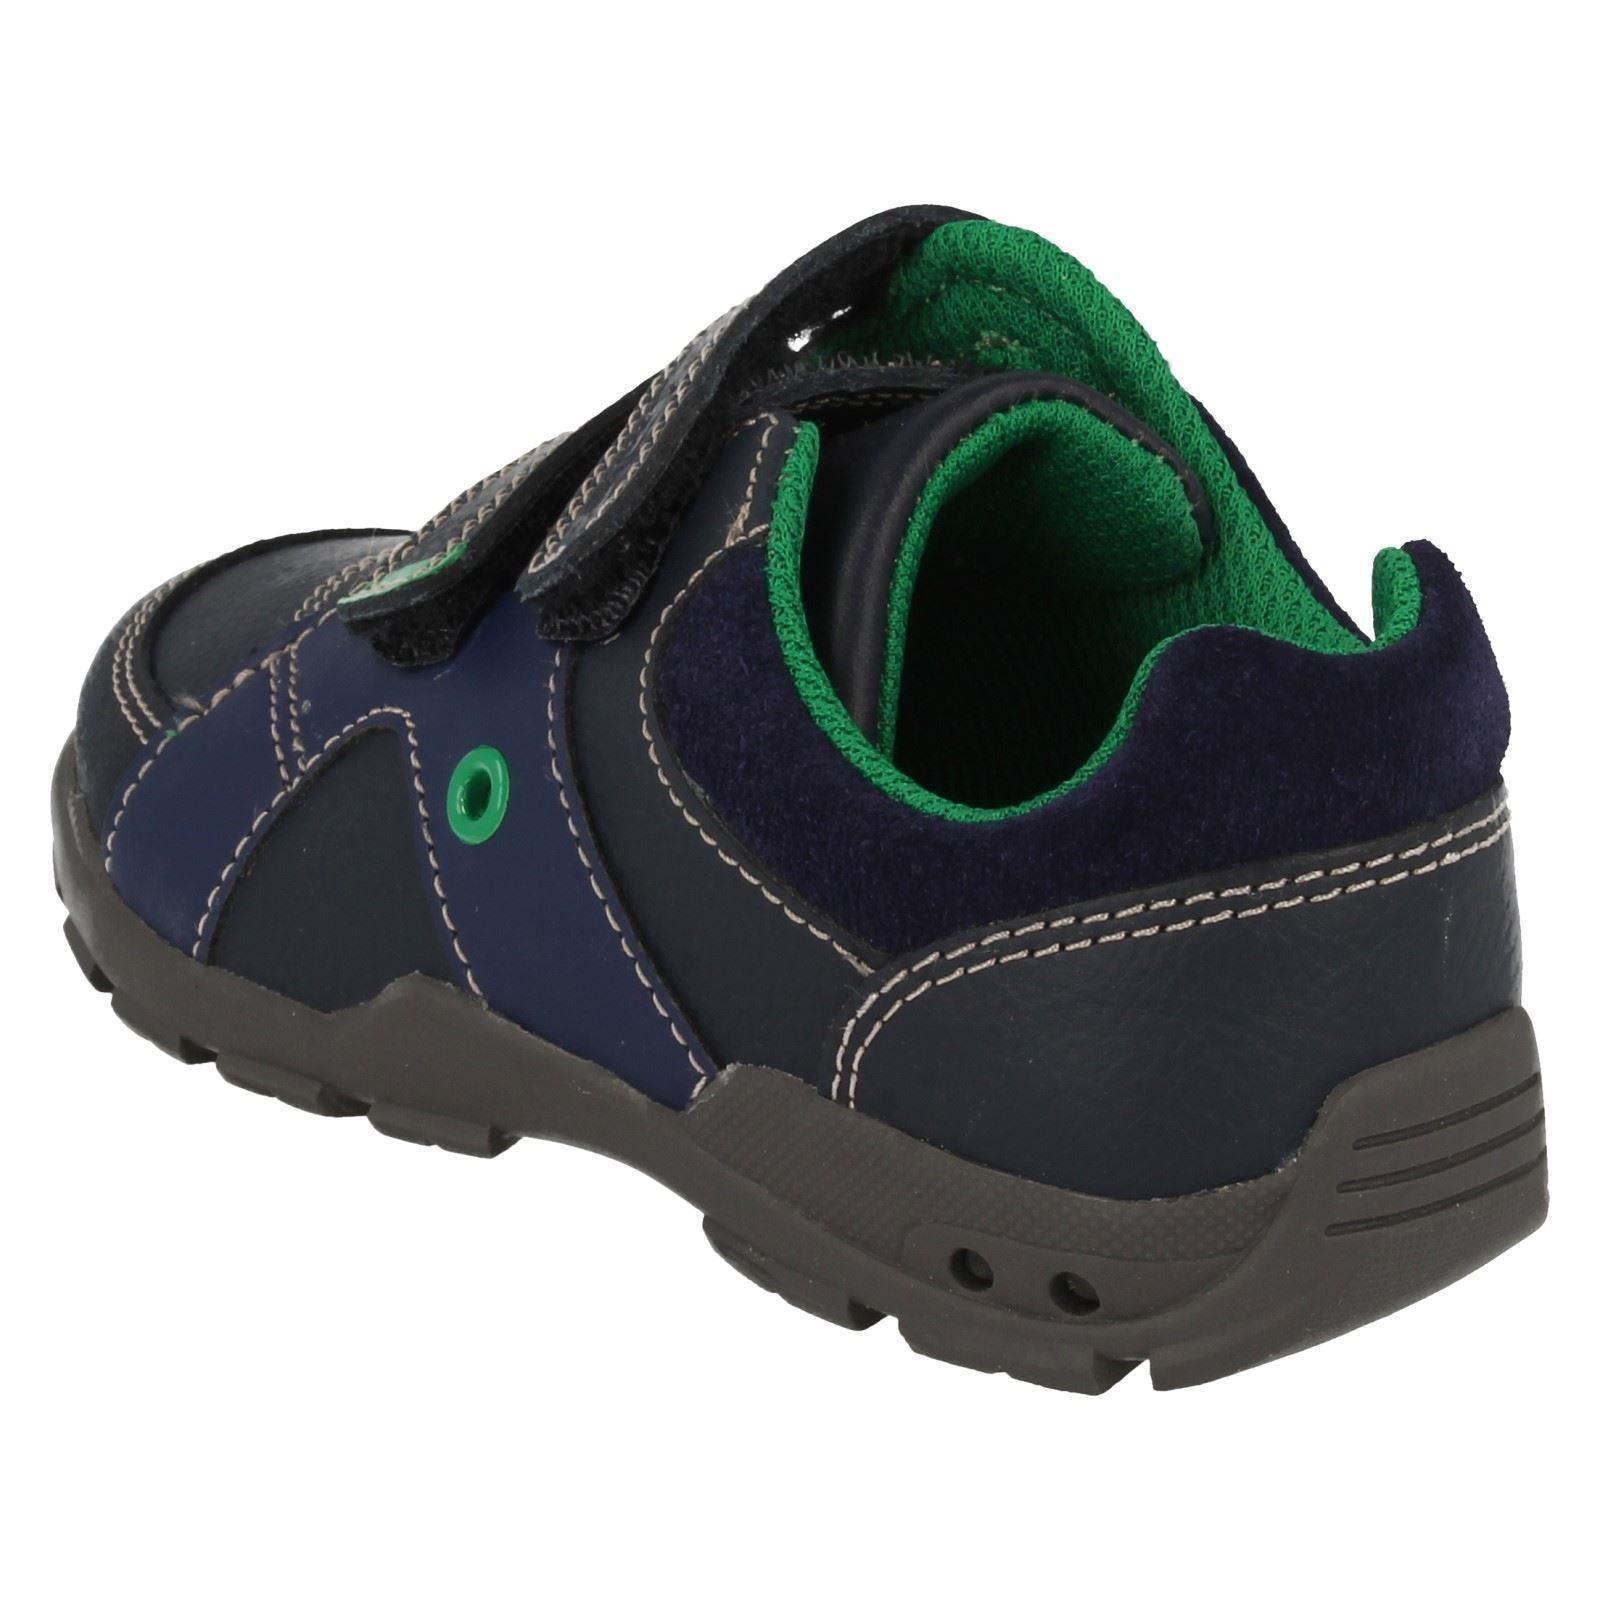 Flash First Navy Shoes blu Clarks Pop Boys q5wt4fZ